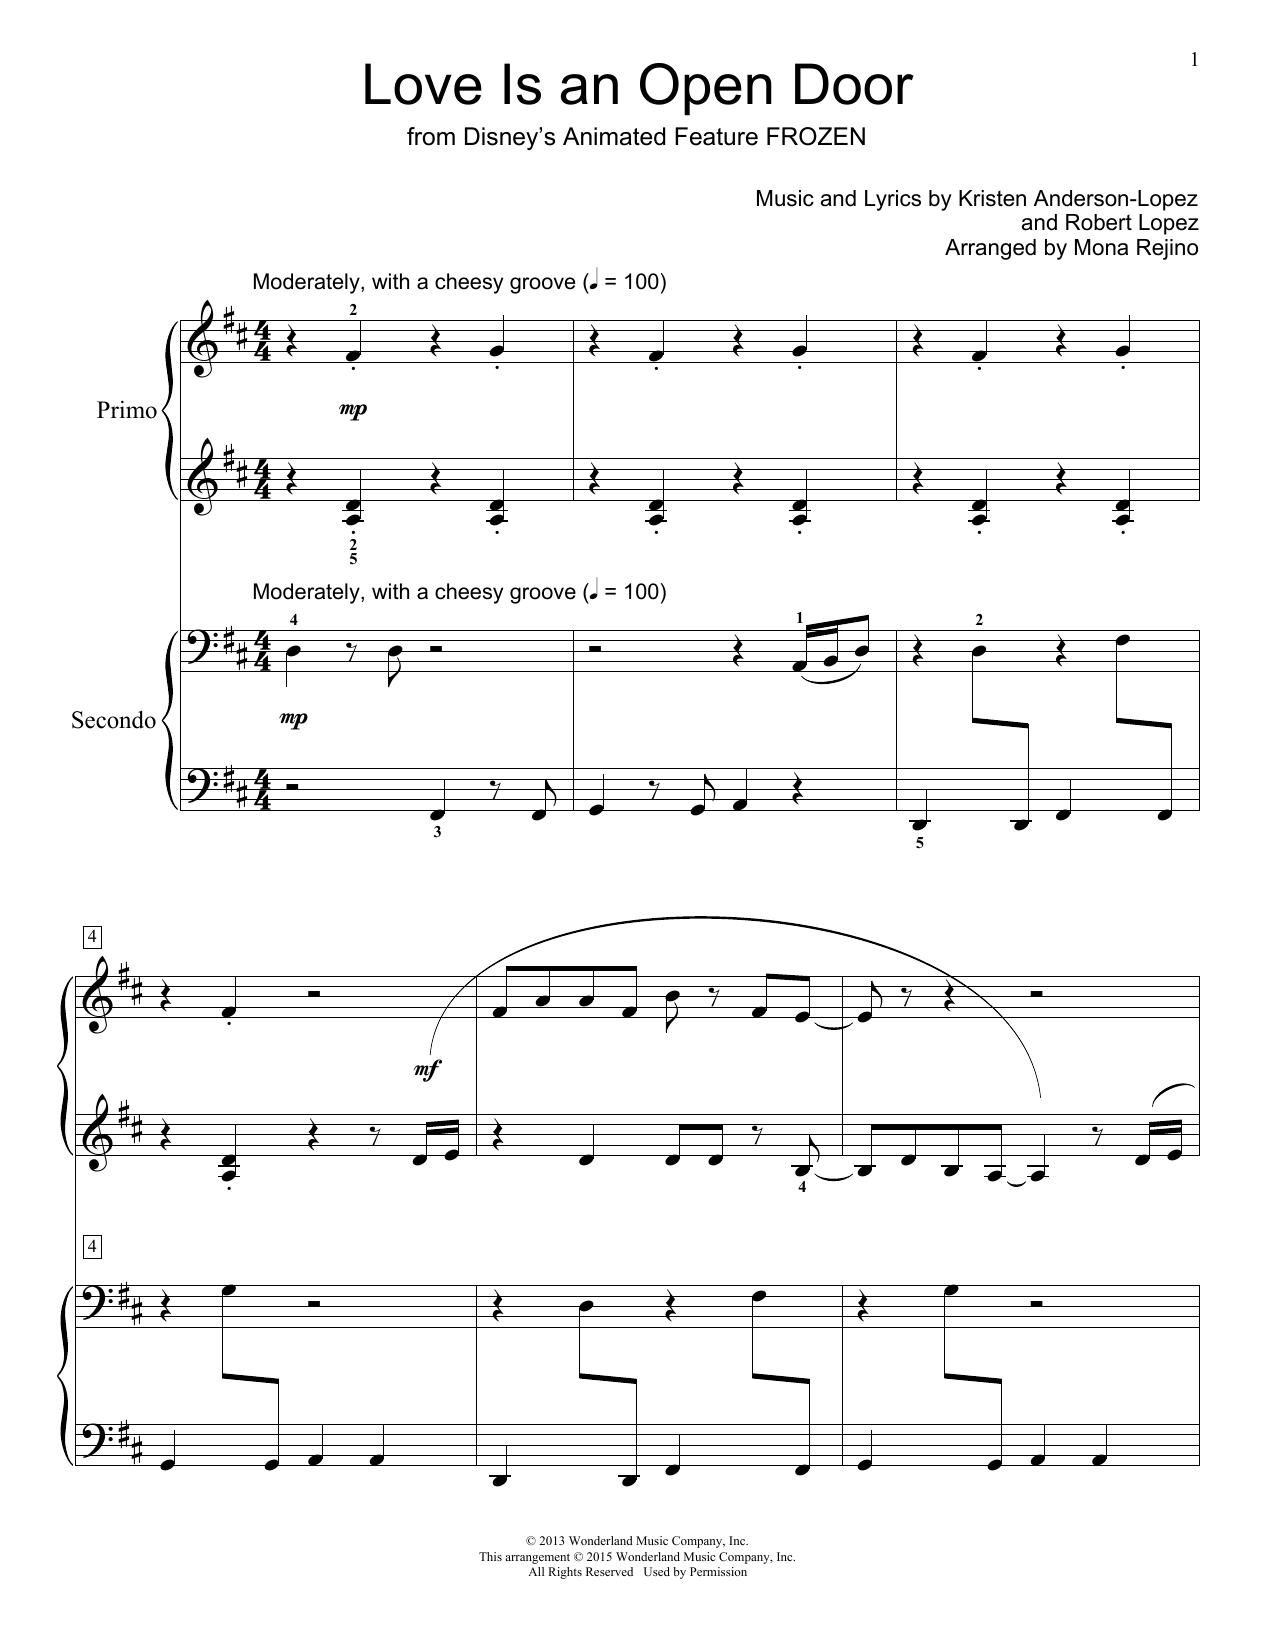 Kristen Bell & Santino Fontana Love Is An Open Door from Disney's Frozen  arr. Mona Rejino Sheet Music Notes, Chords   Download Printable Piano ...